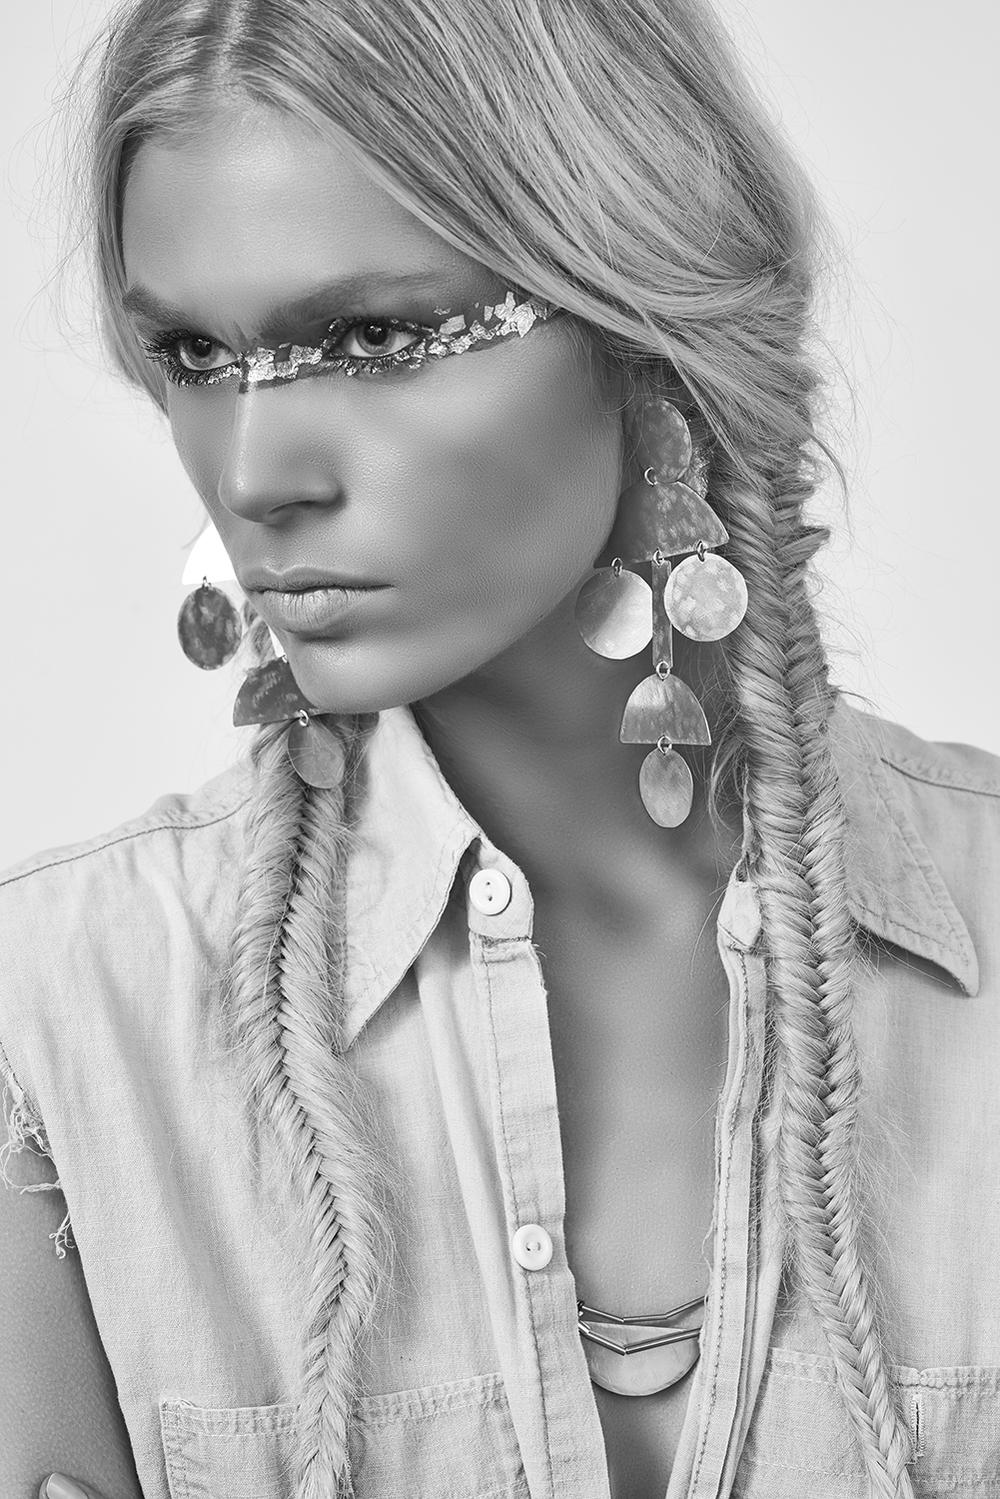 Tinashe Farfetch4643.jpg